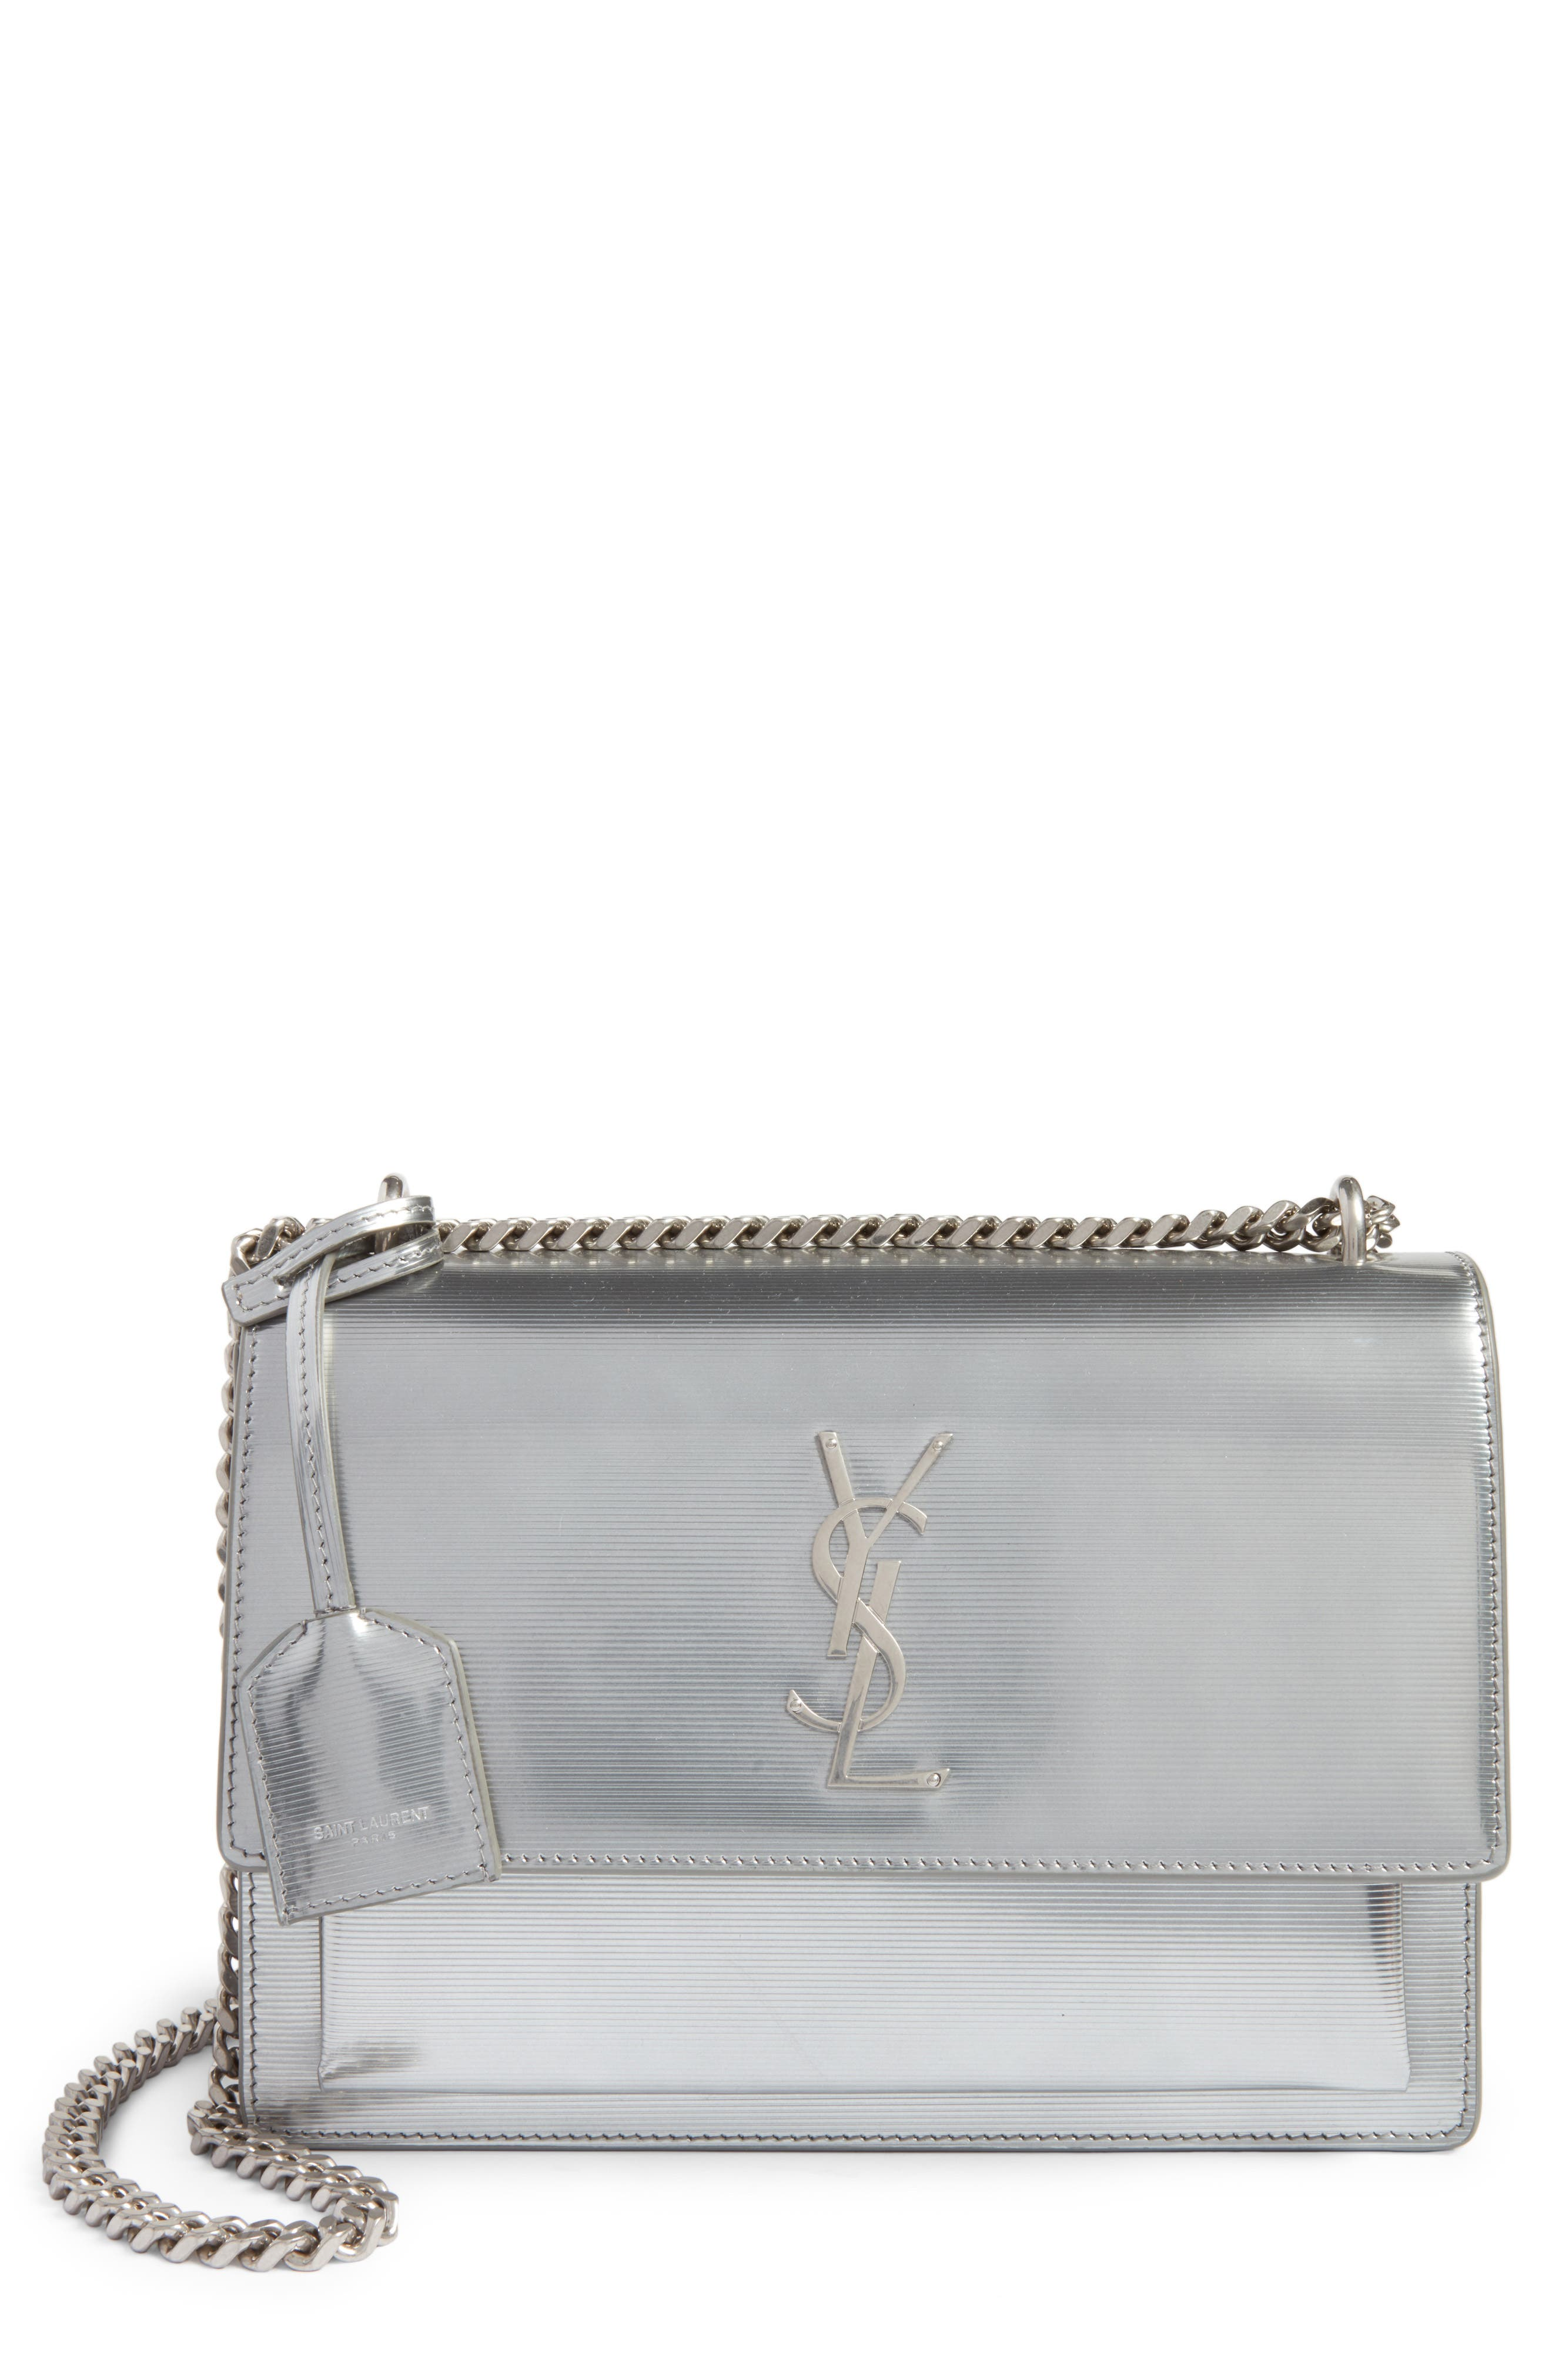 Medium Sunset Opium Leather Crossbody Bag,                         Main,                         color, Dark Silver